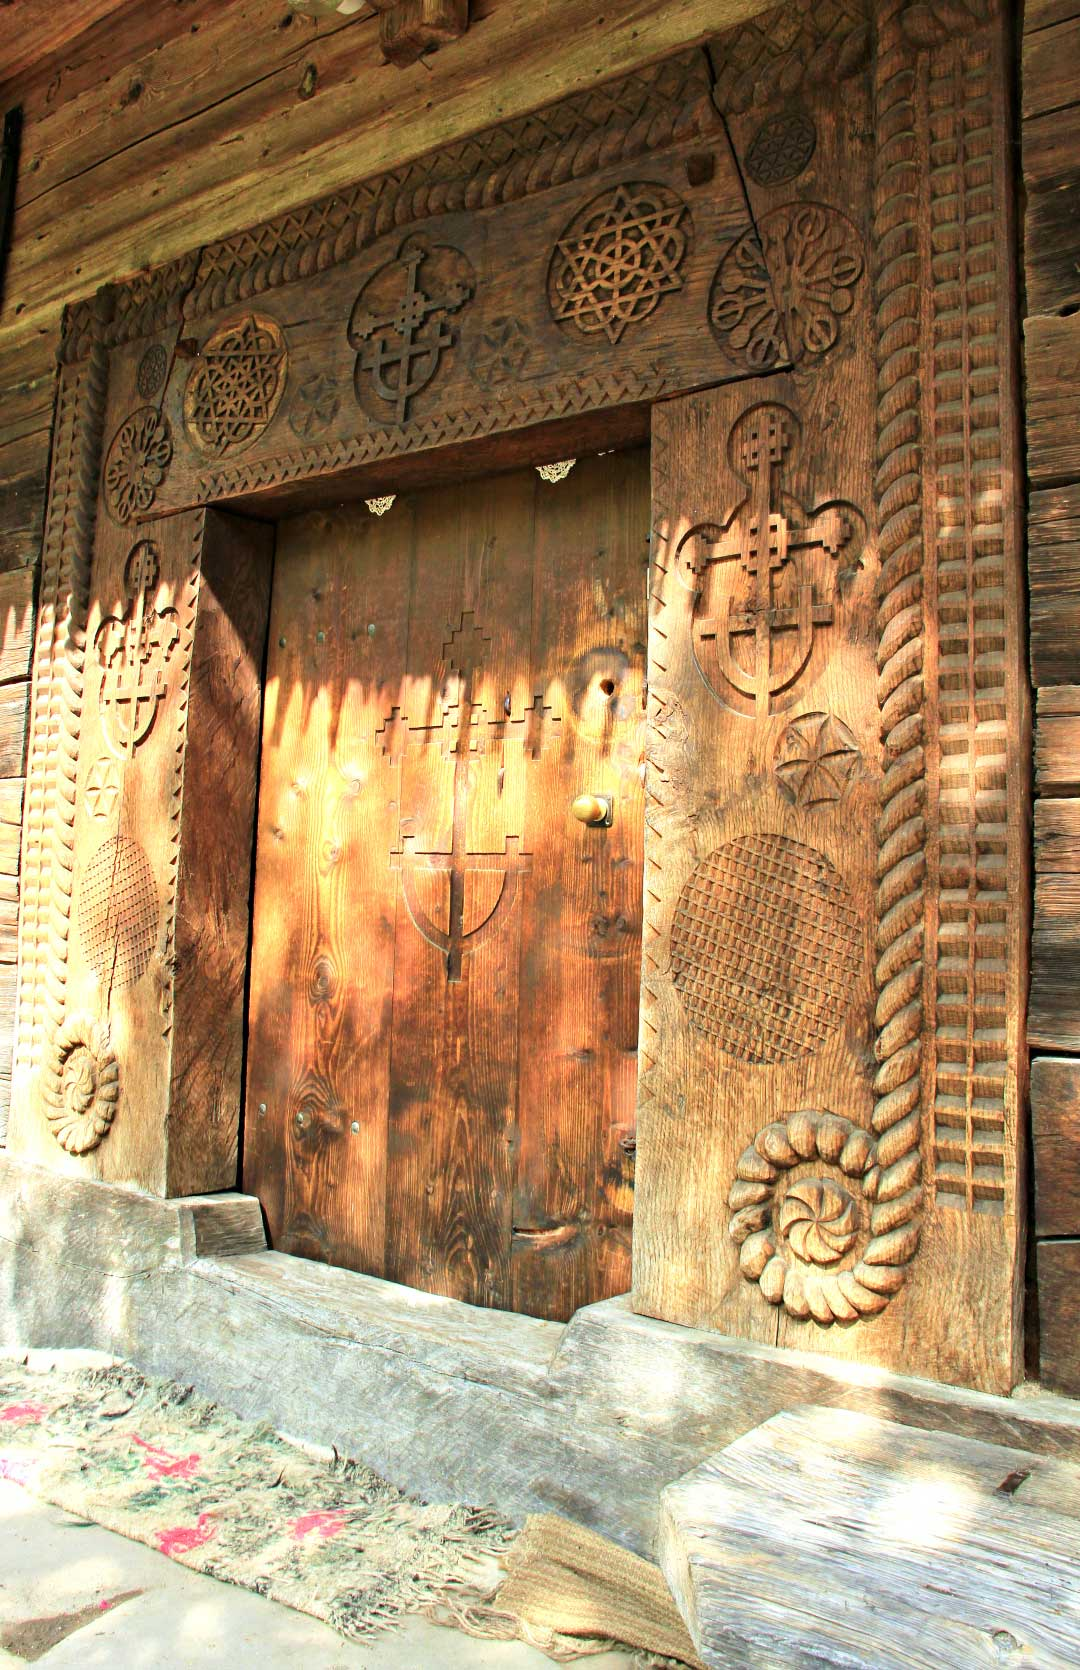 The entrance door of the church. Photo by Ovidiu Balaj